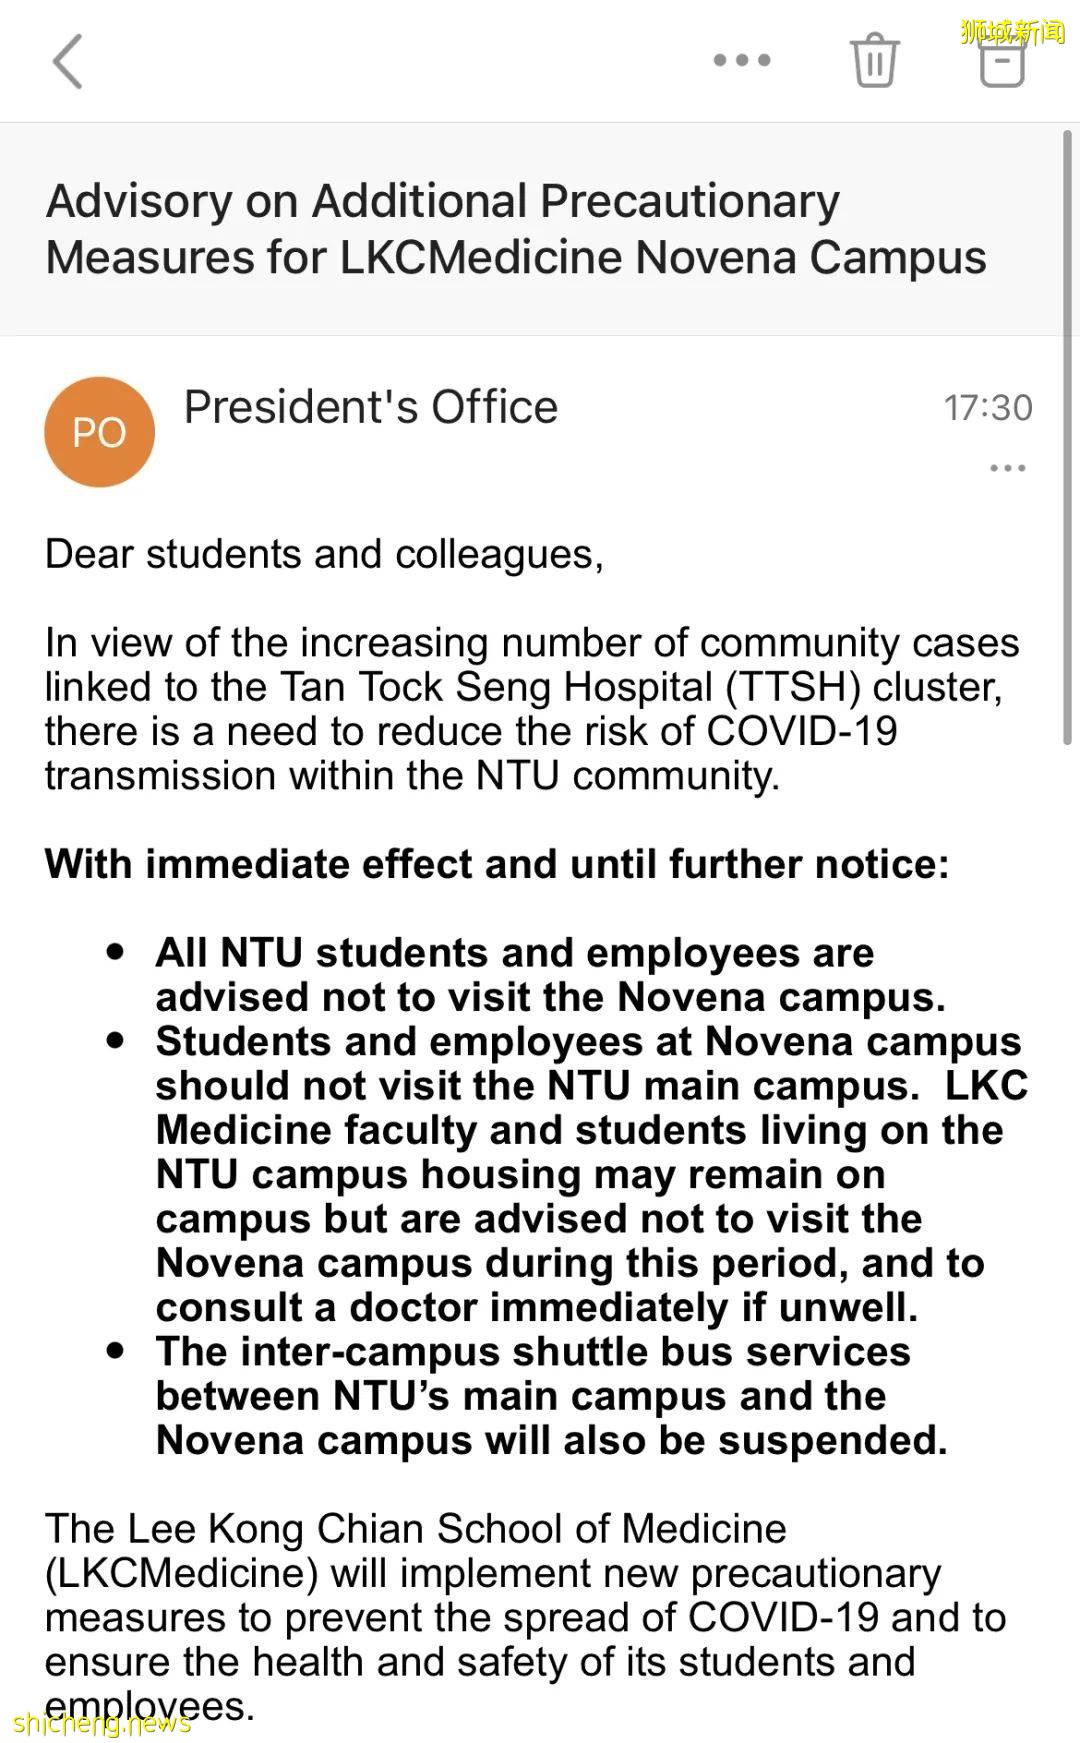 NTU Novena校区高度戒备,穿梭巴士停运,师生居家办公学习